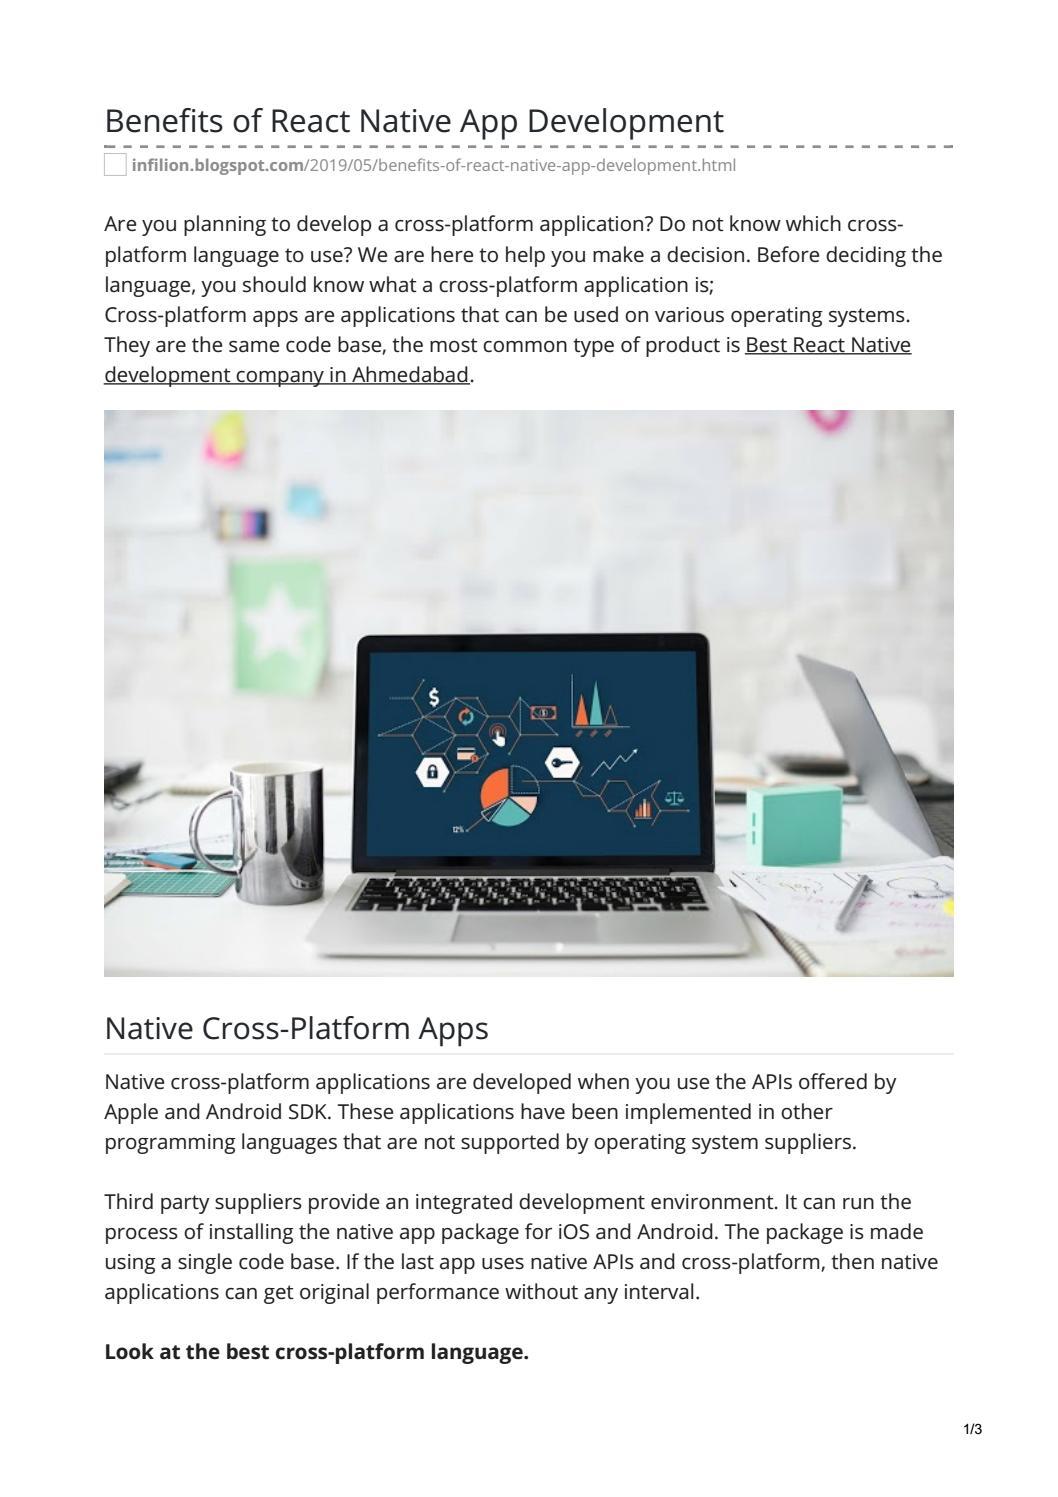 Benefits of React Native App Development by infilon - issuu